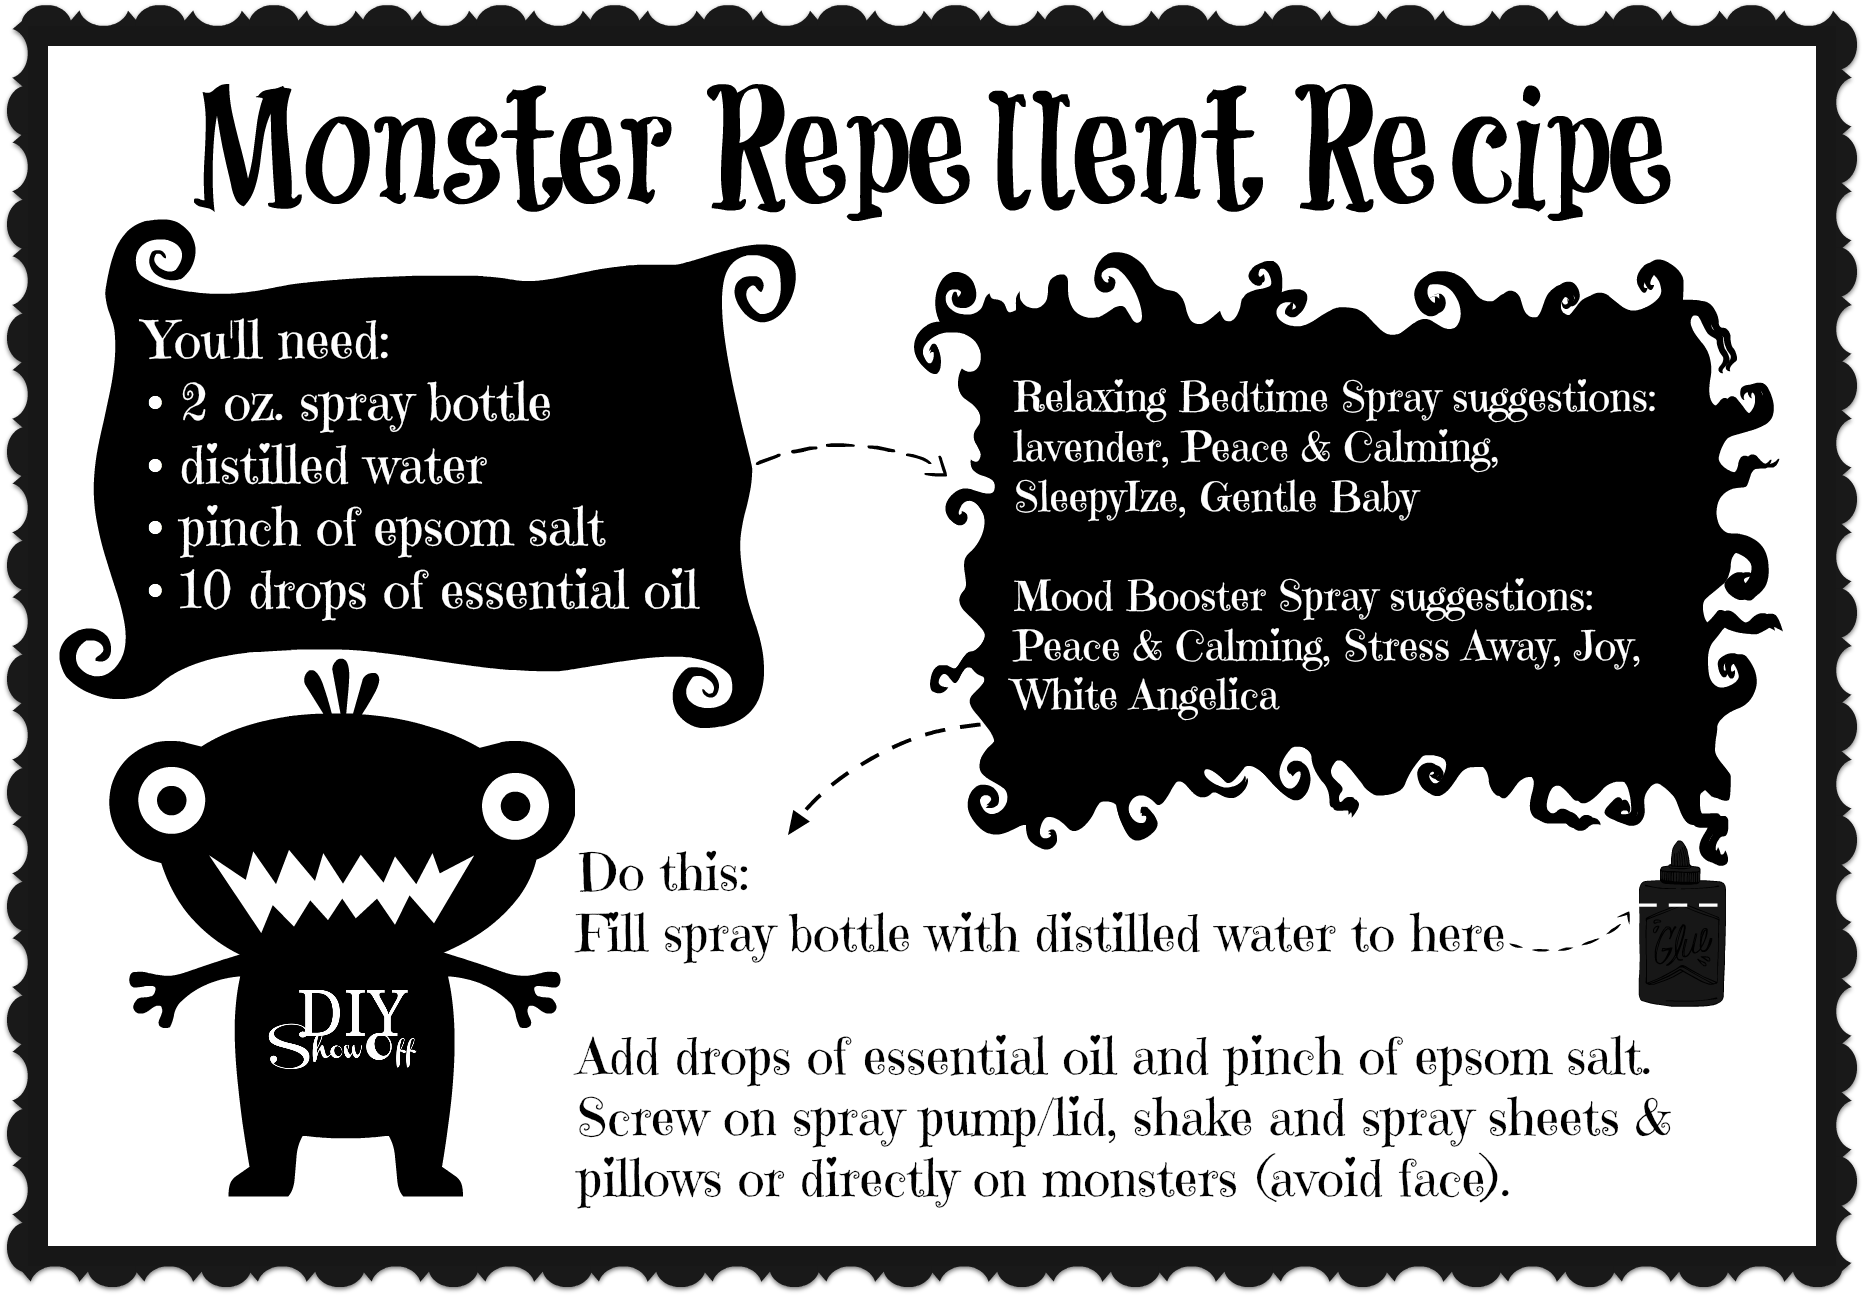 Halloween essential oils Make & Take ideas, graphics and printables @diyshowoff